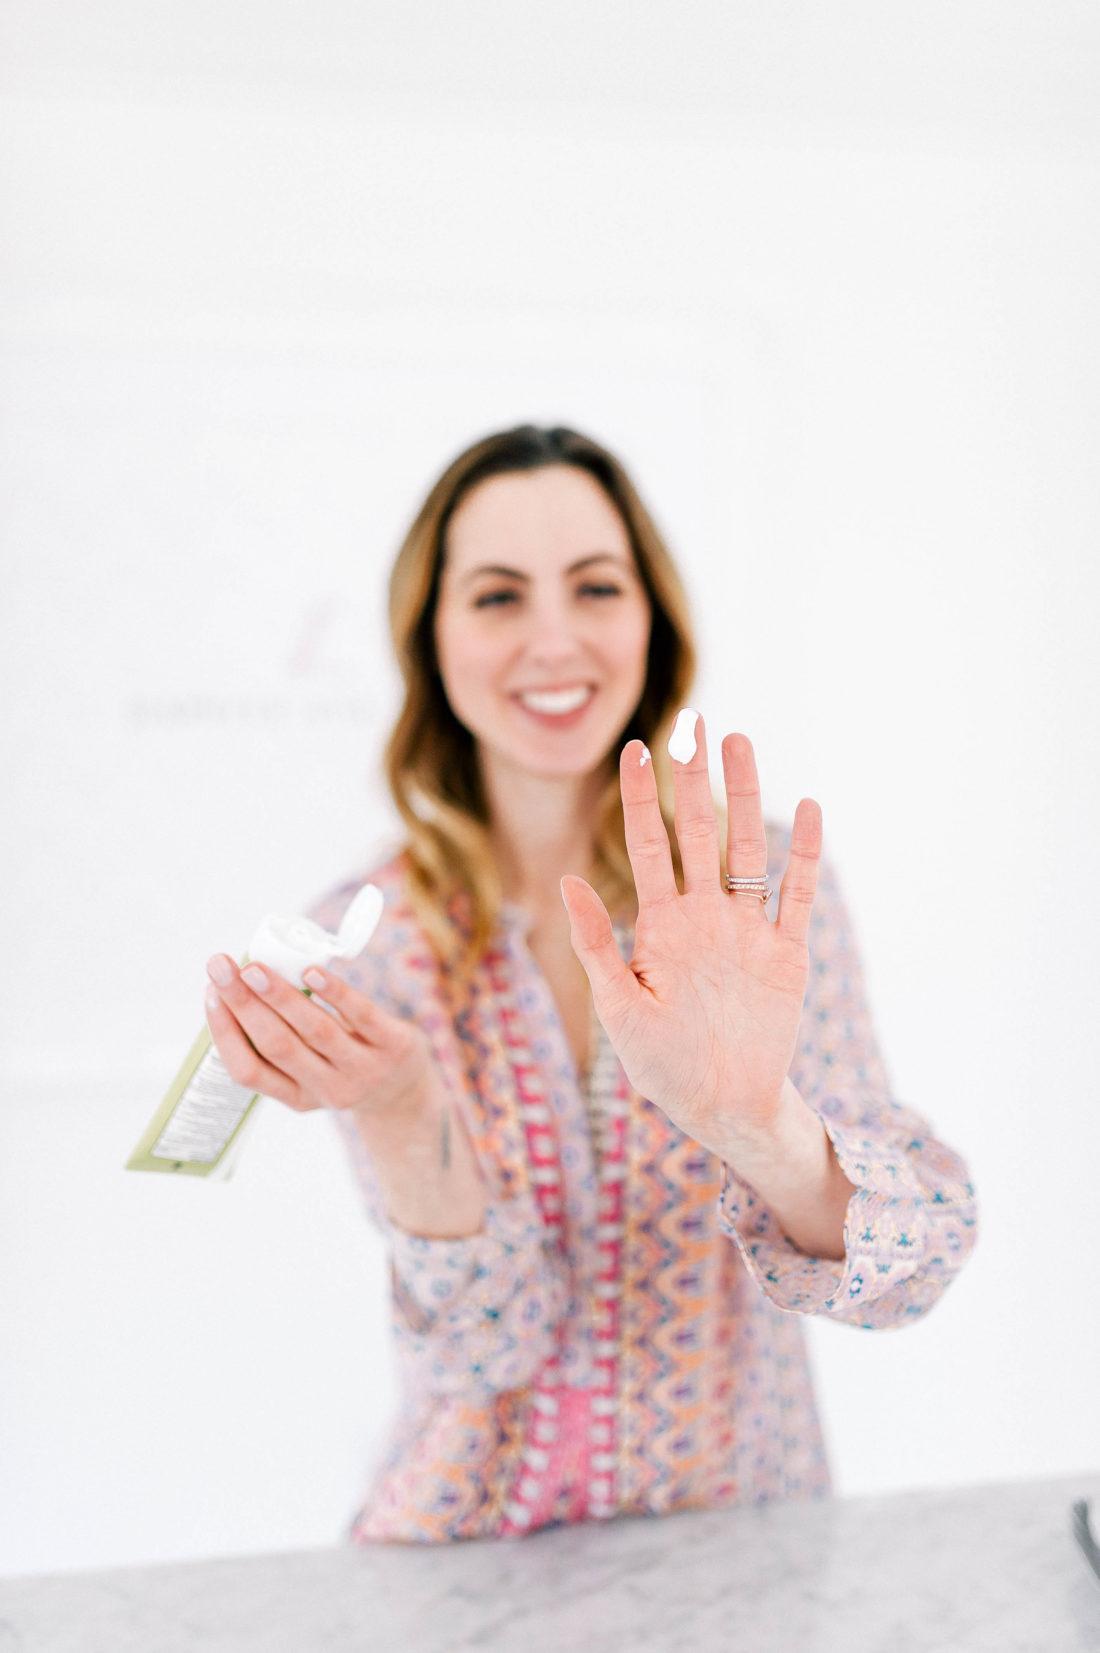 Eva Amurri Martino tests out an all natural diaper cream